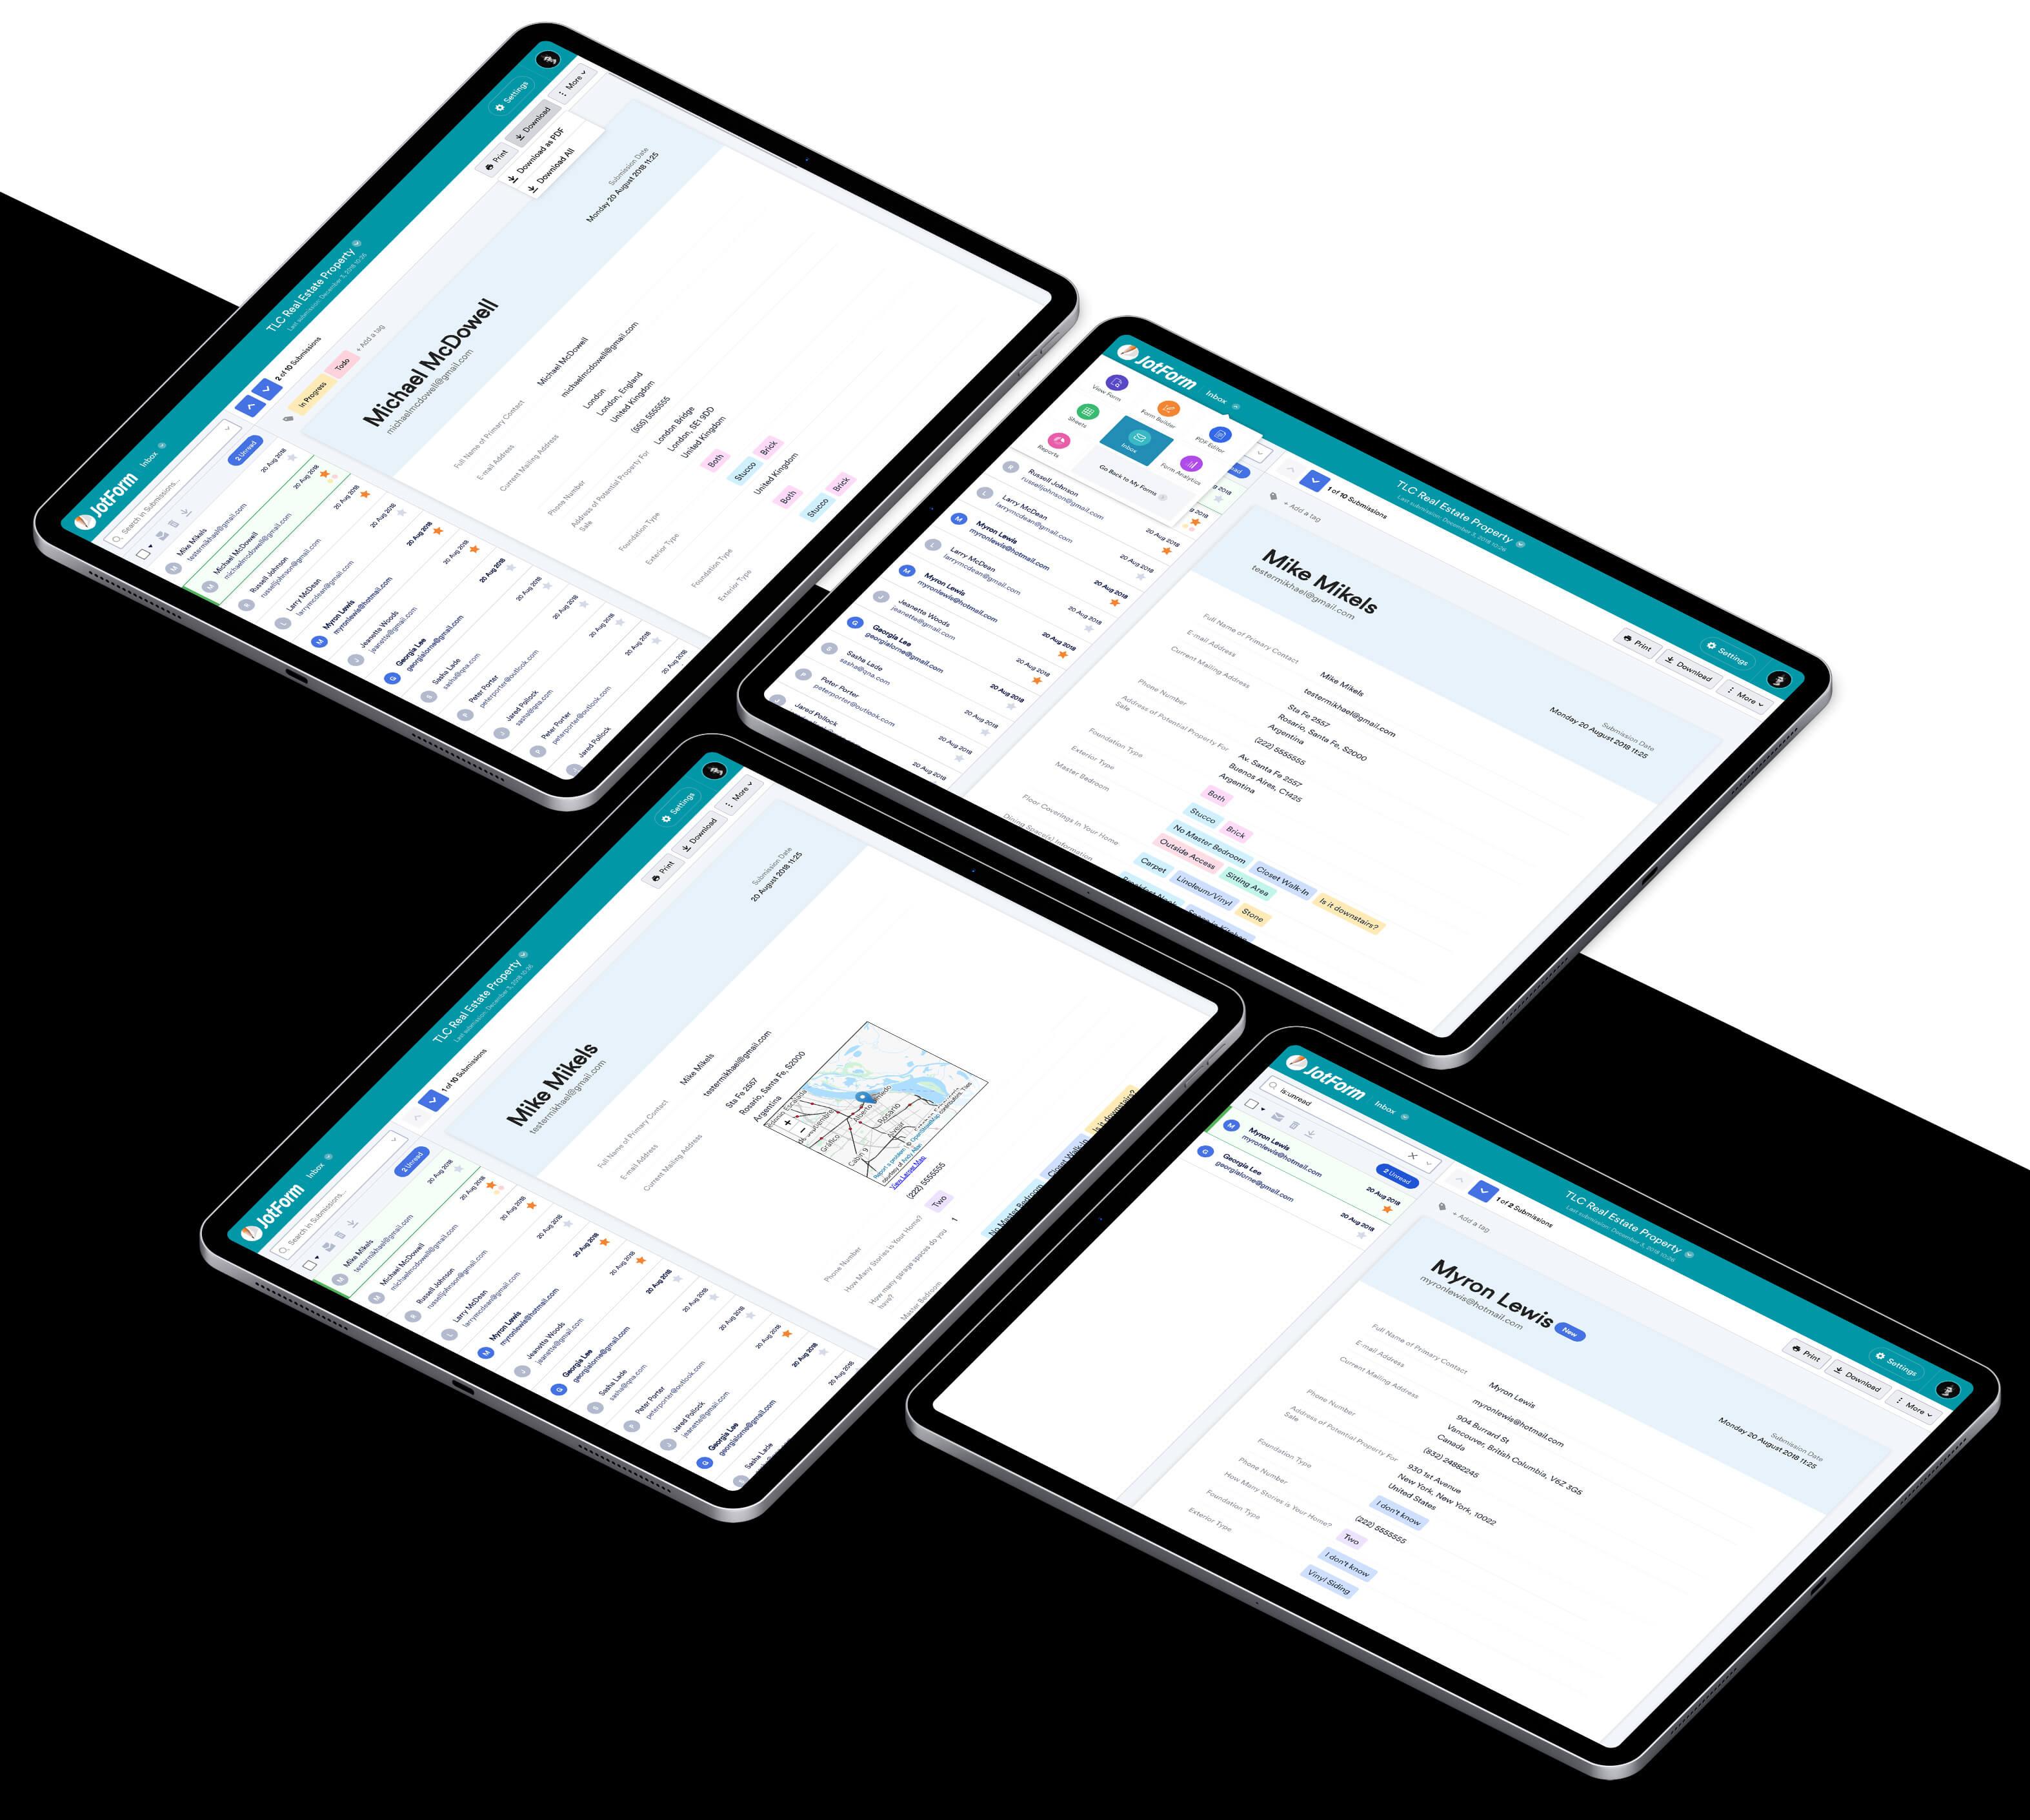 jotform-inbox-new-layout